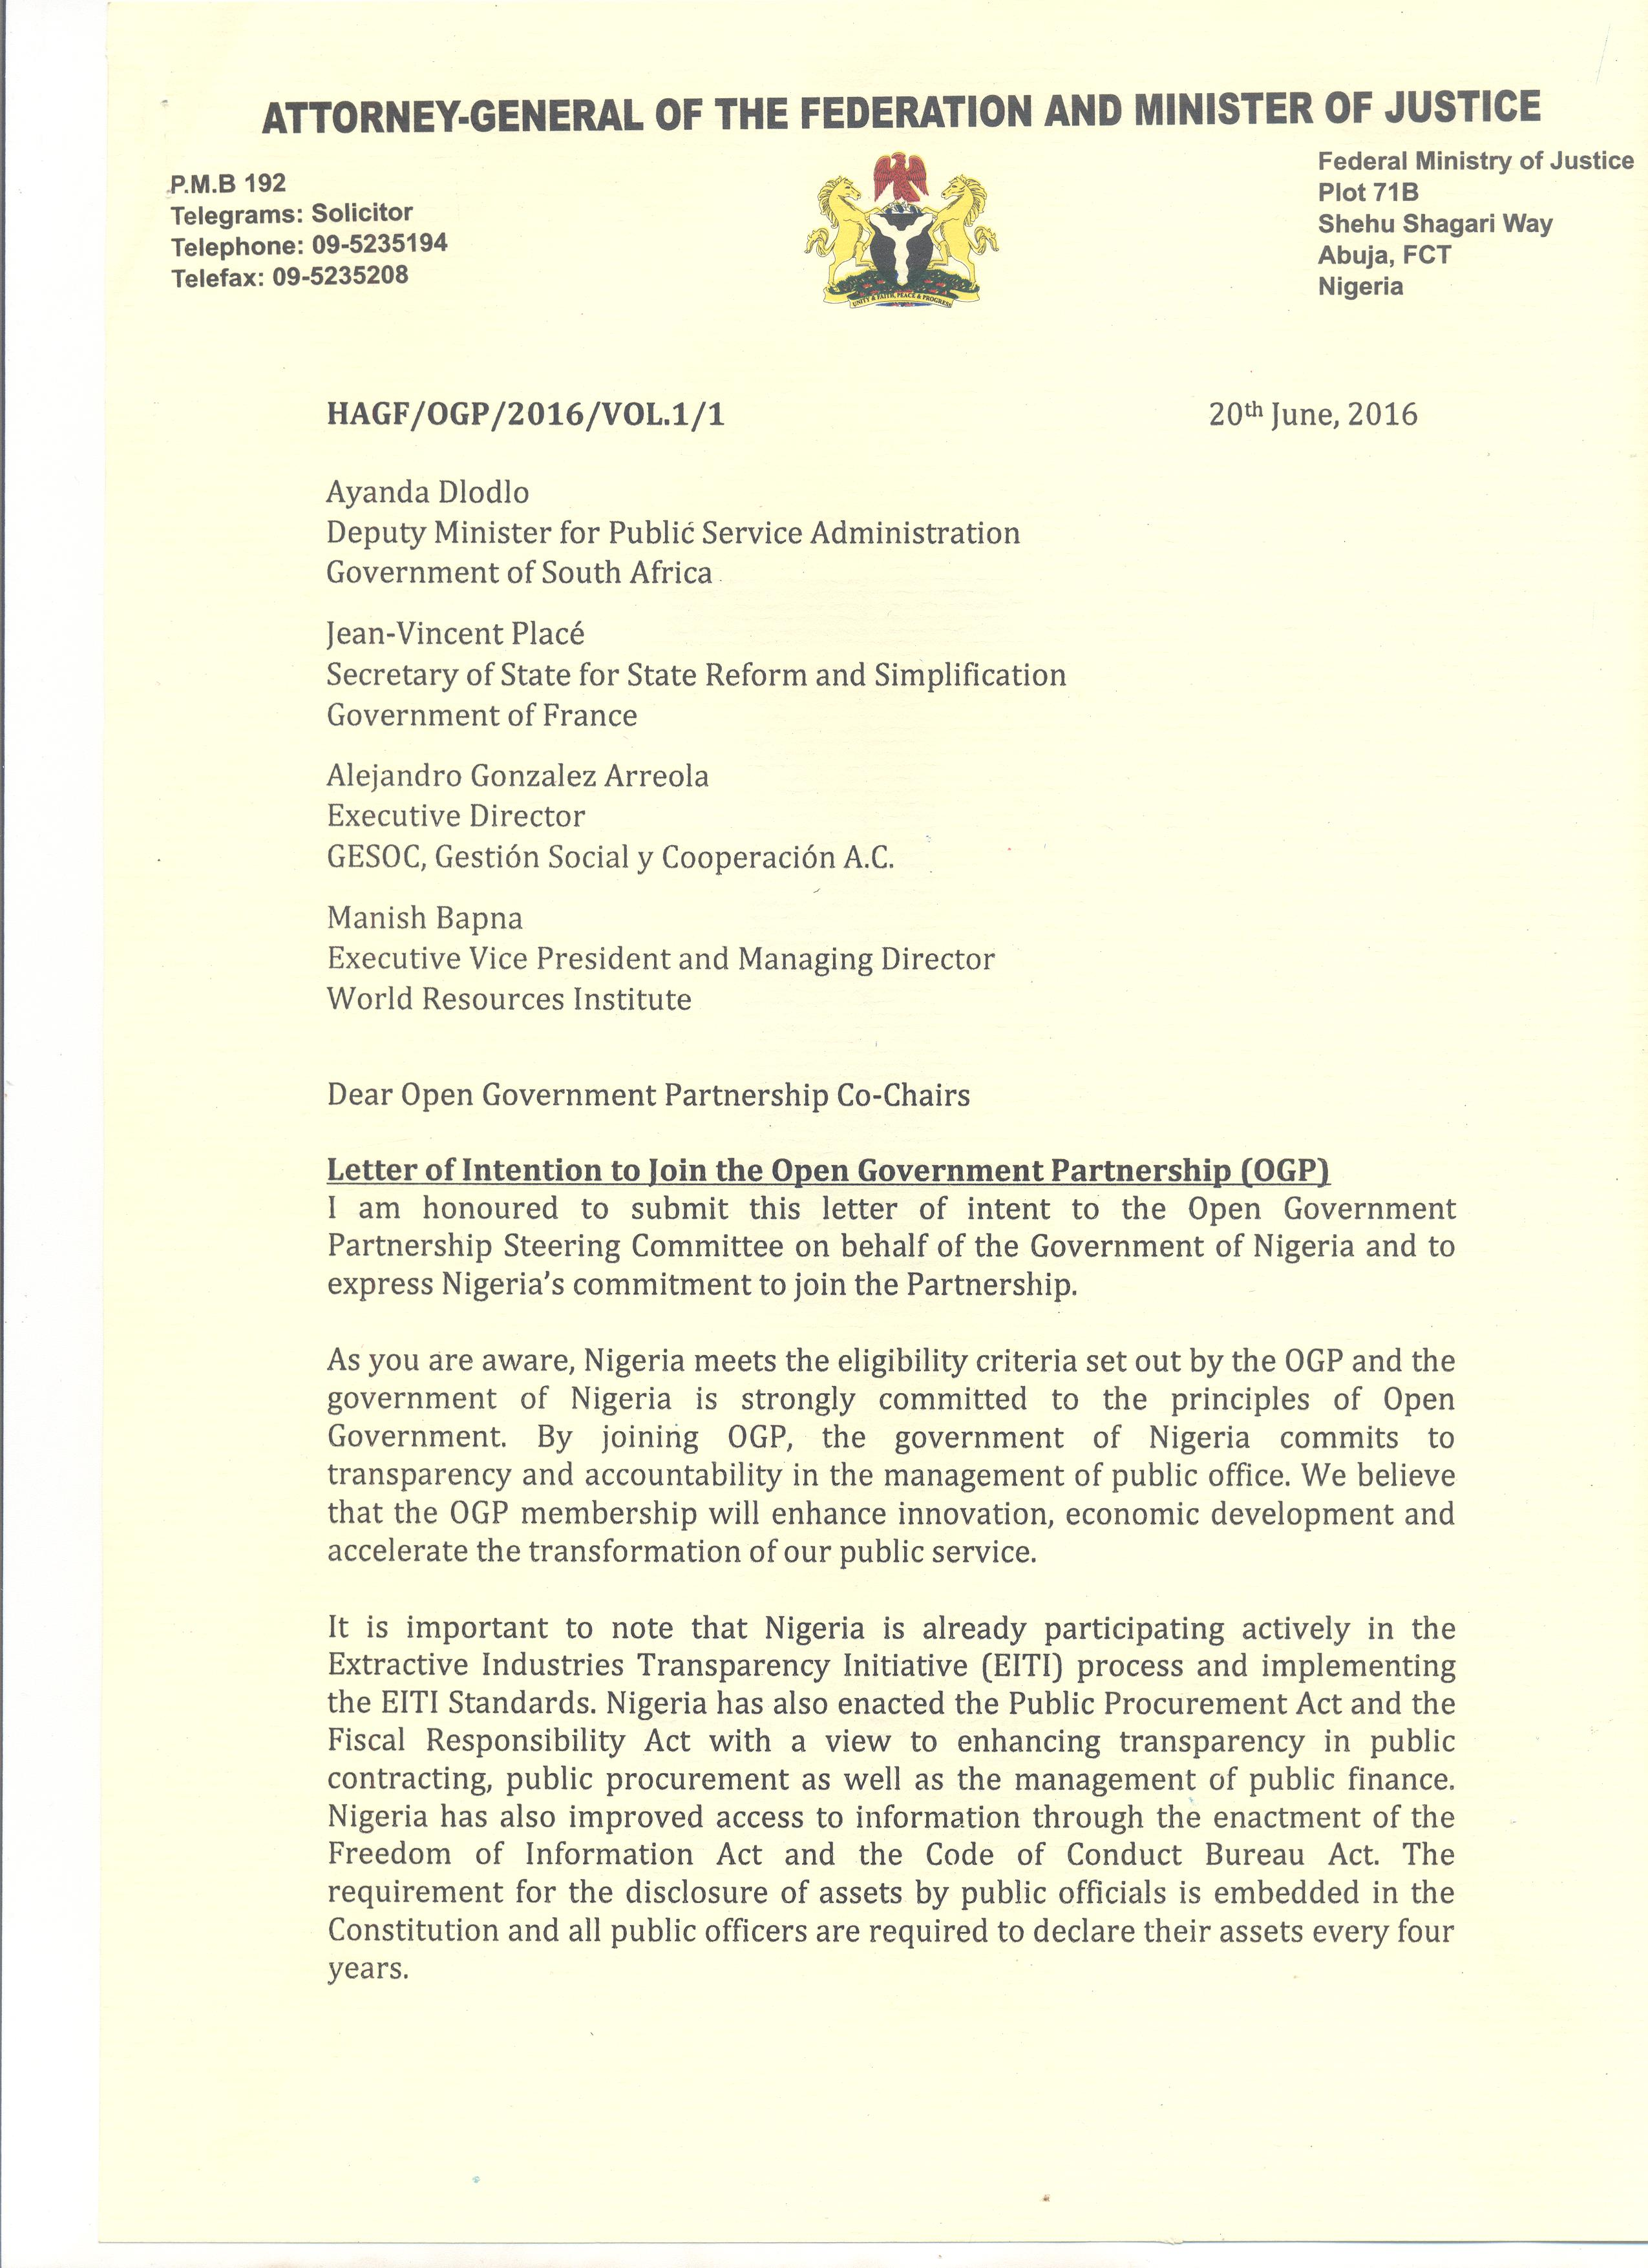 Nigeria Open Government Partnership